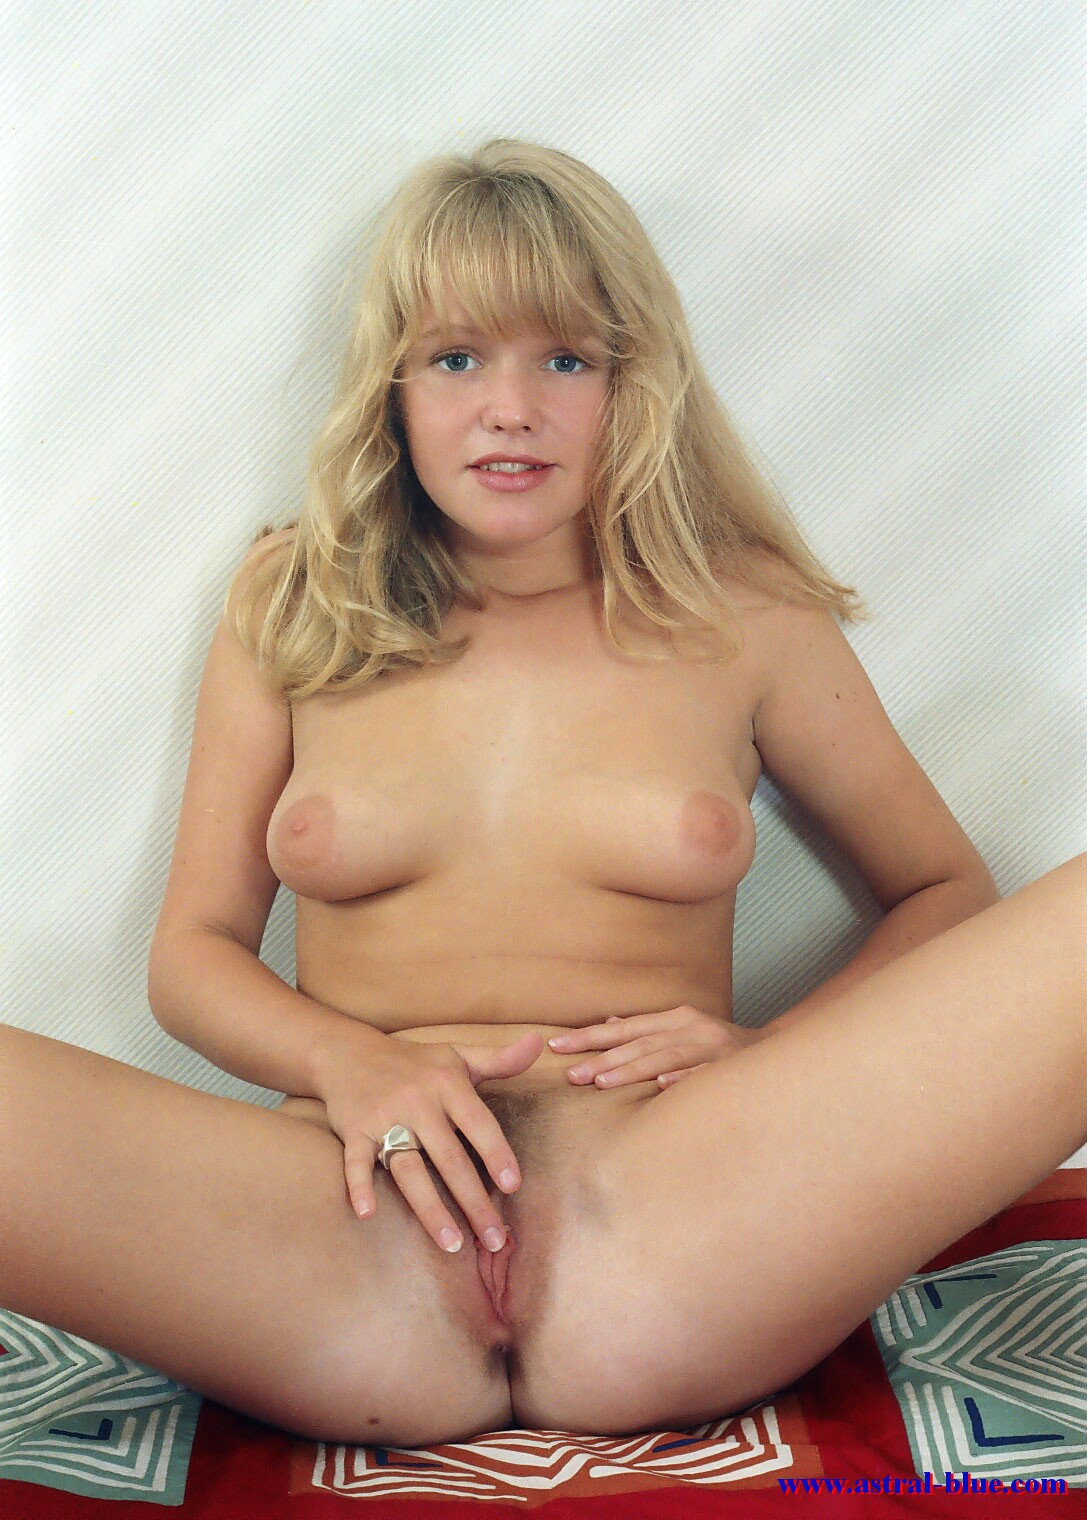 big tity gothic girls fucking nude